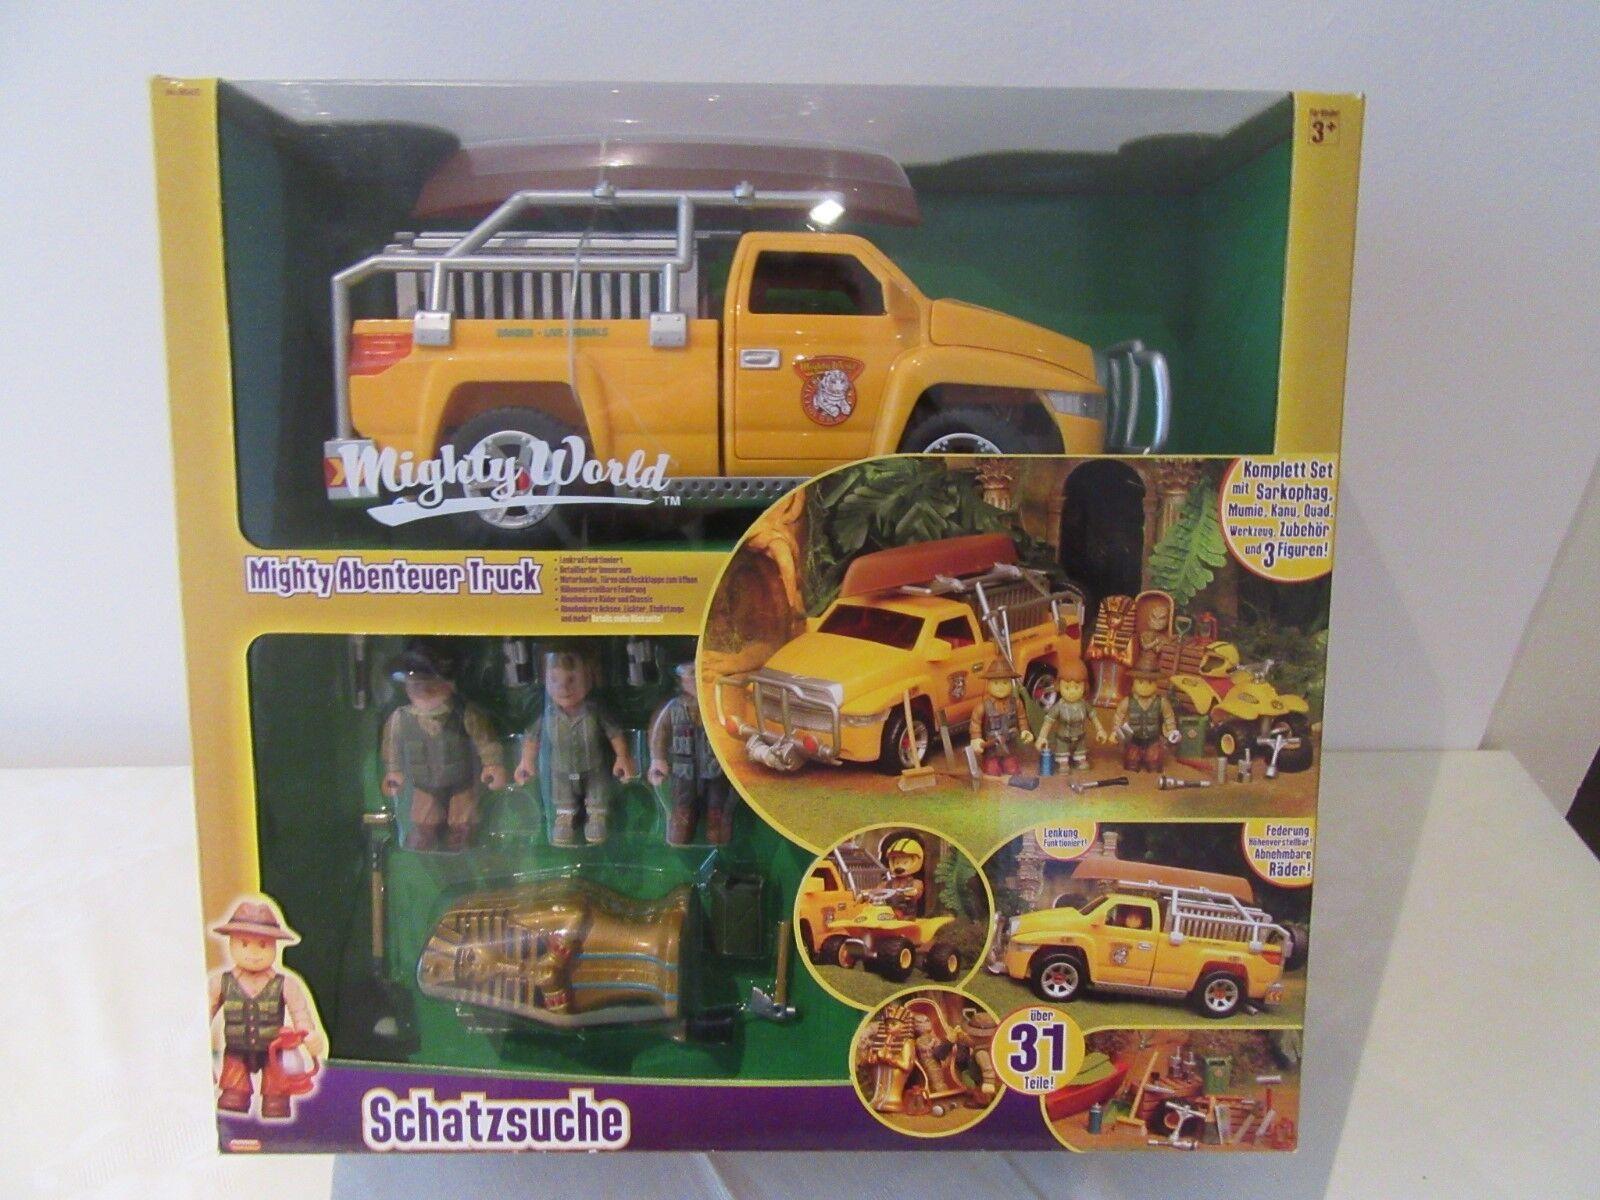 Mighty world toys  avontuur met truck.